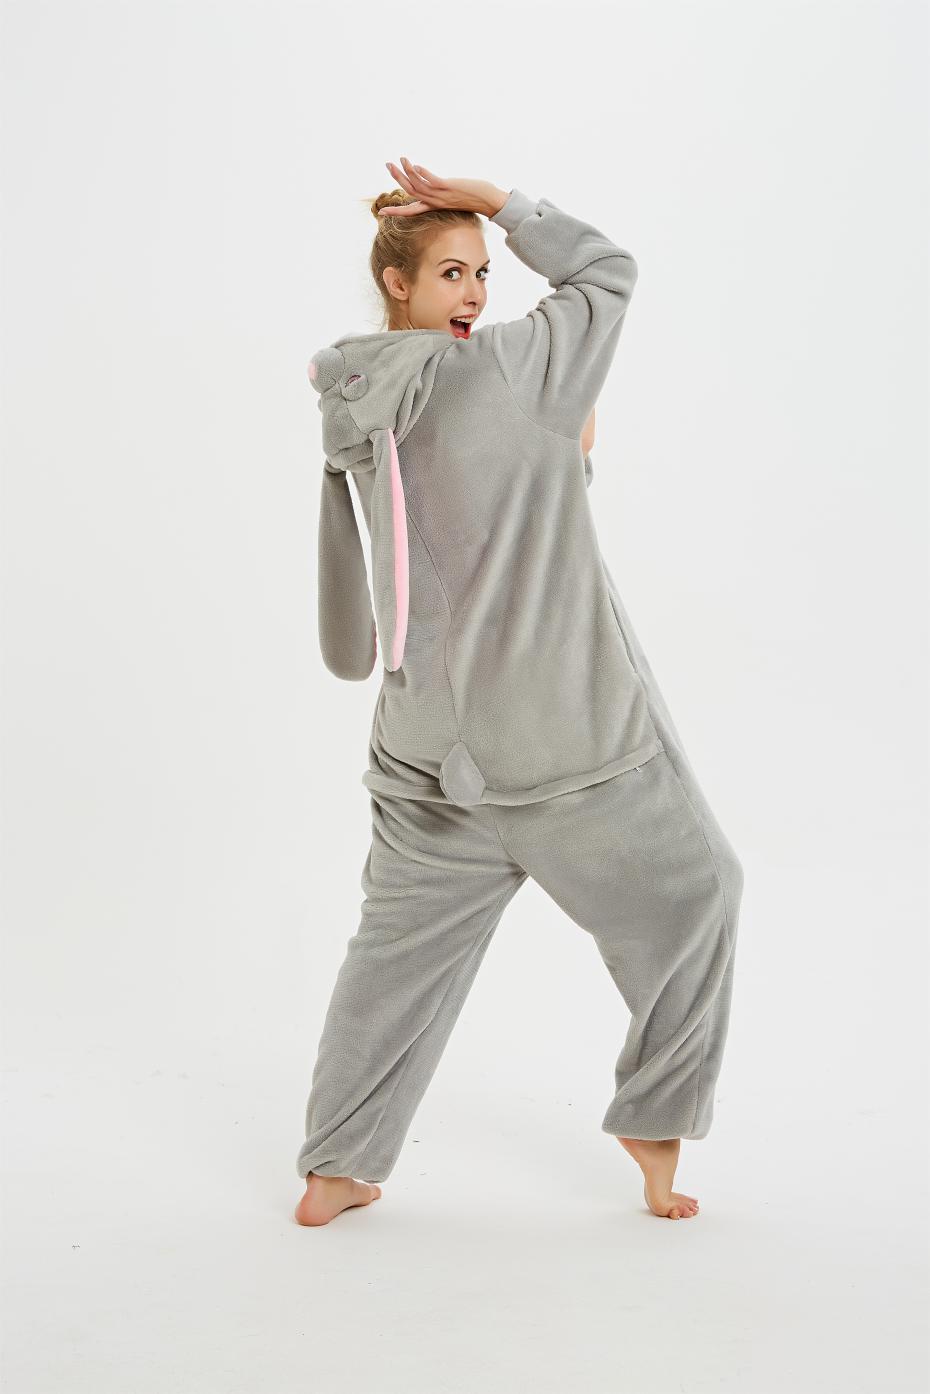 Image 3 - Adult Animal Pajamas Long Sleeve Sleepwear kigurumi All in One Pyjama Animal Suits Rabbit Garments Women Animal Cartoon Onesies-in Pajama Sets from Underwear & Sleepwears